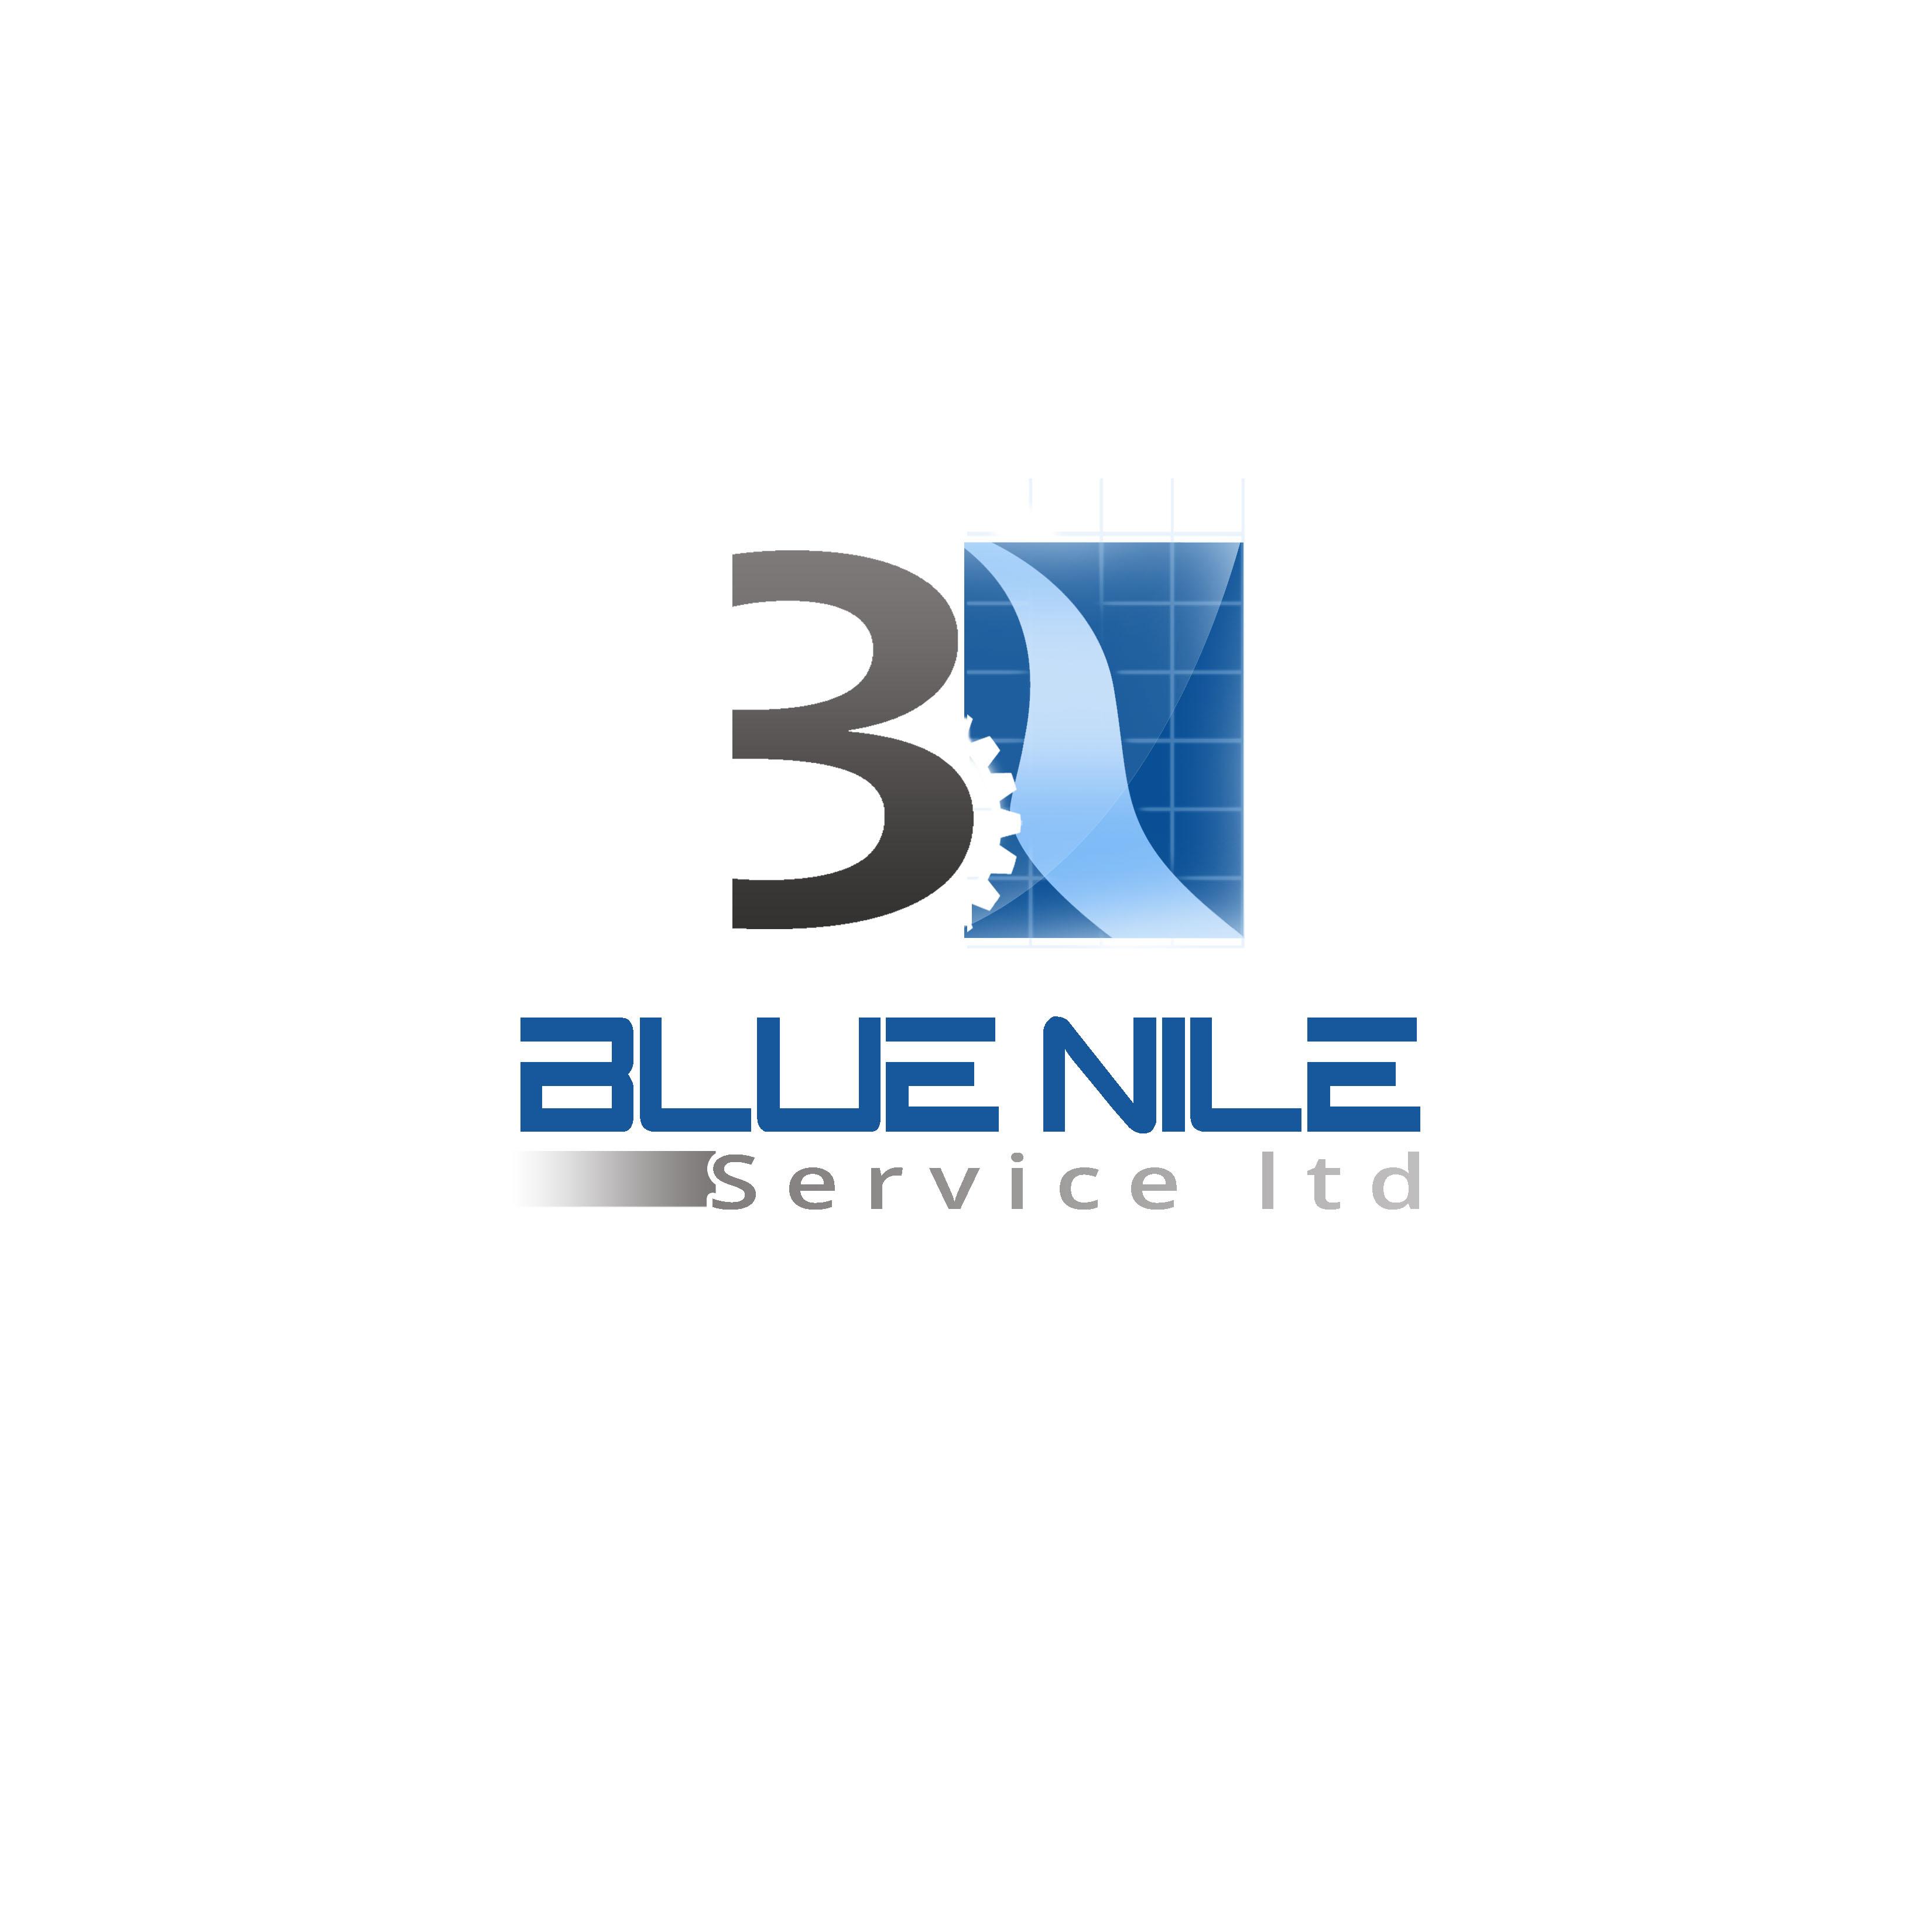 Logo Design by Allan Esclamado - Entry No. 8 in the Logo Design Contest Imaginative Logo Design for Blue Nile Service Ltd.